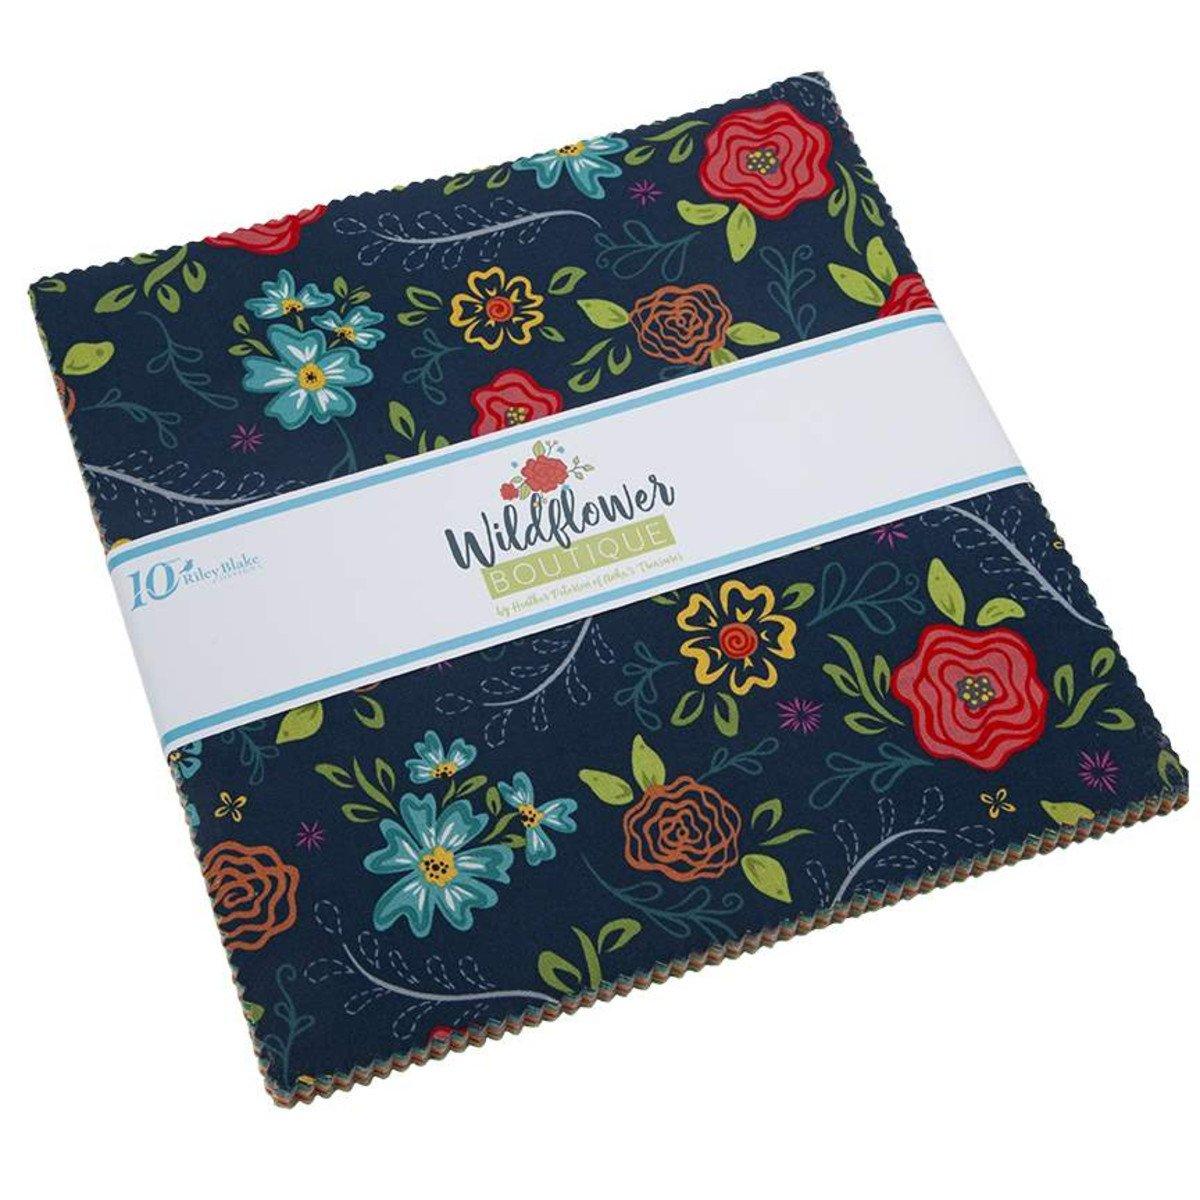 Wildflower Bouquet 10 Squares (42)